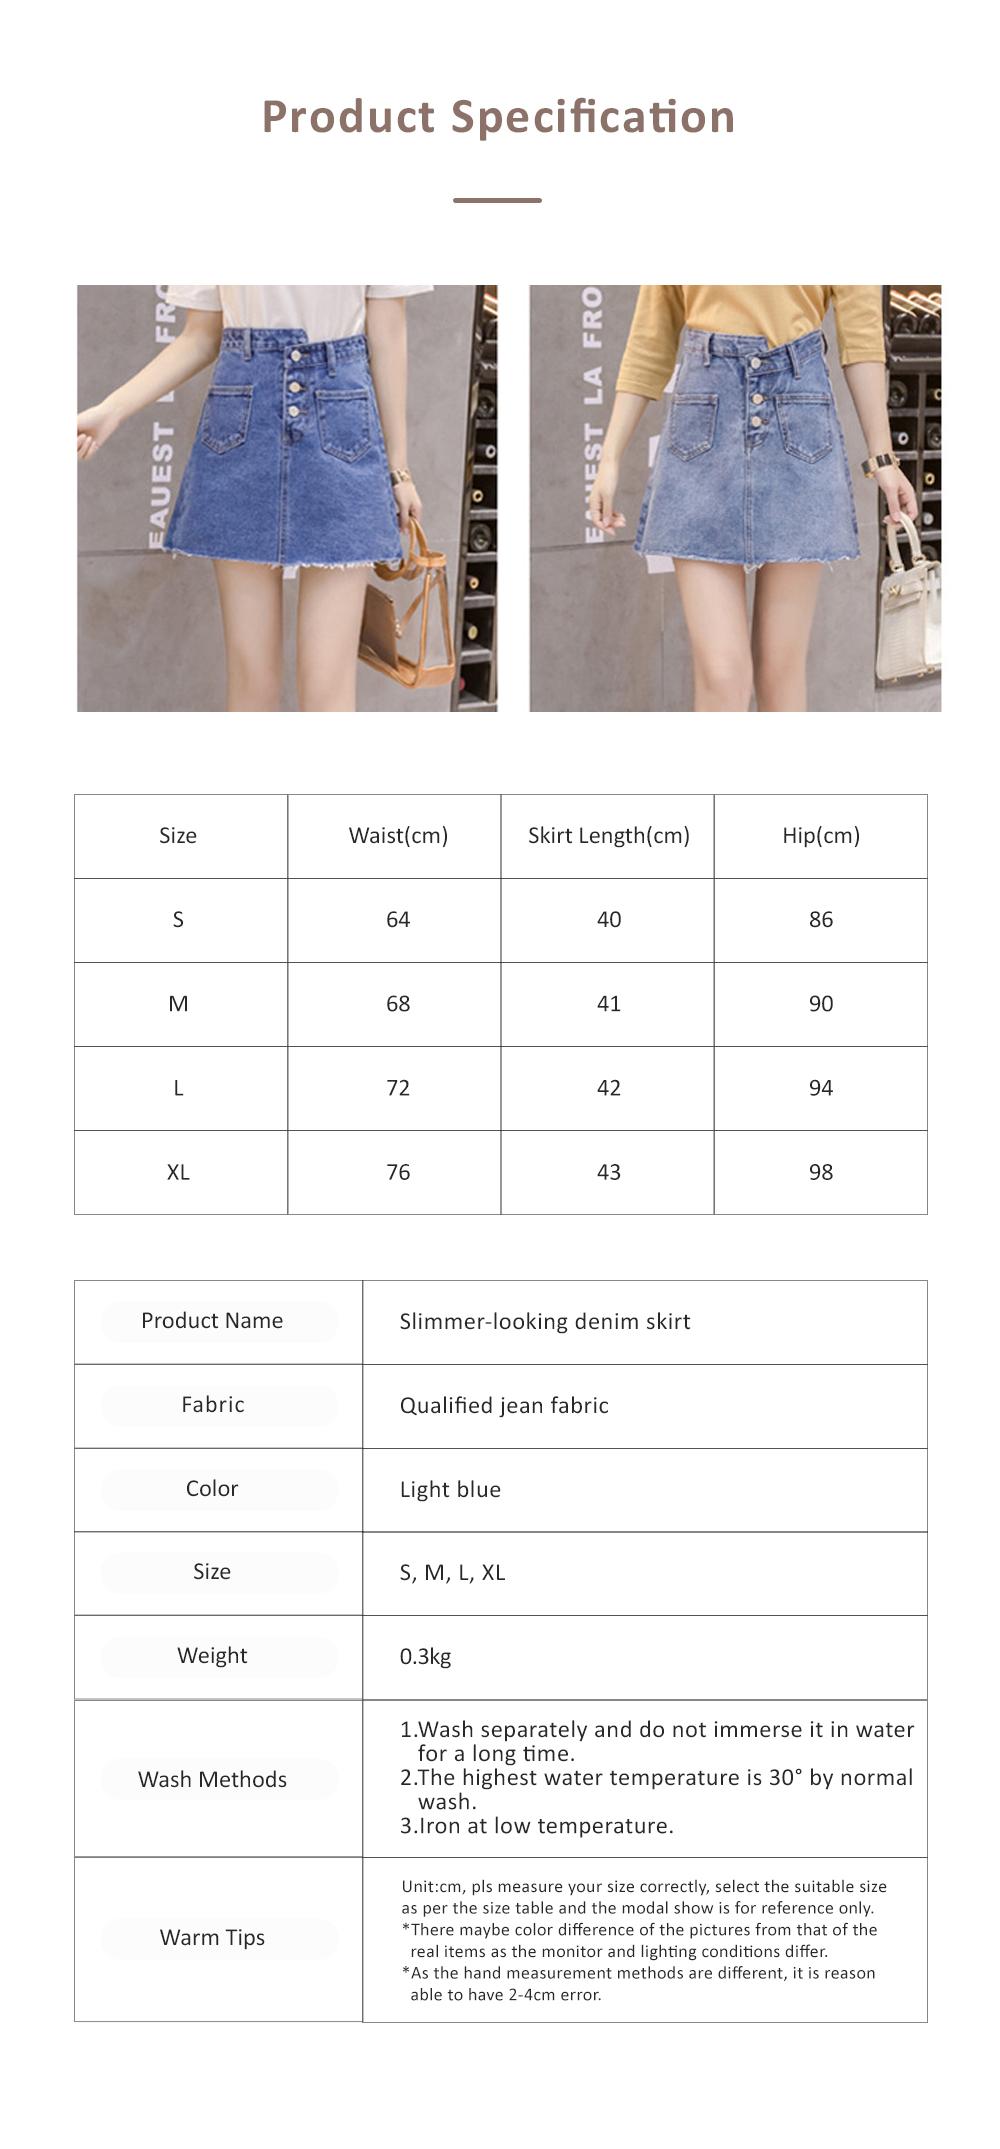 Close-fitting Irregular Denim Skirt for Women in Summer High-waisted Slimmer-looking Sheath Dress Hairy Brim Jean Midskirt Women Dress 6